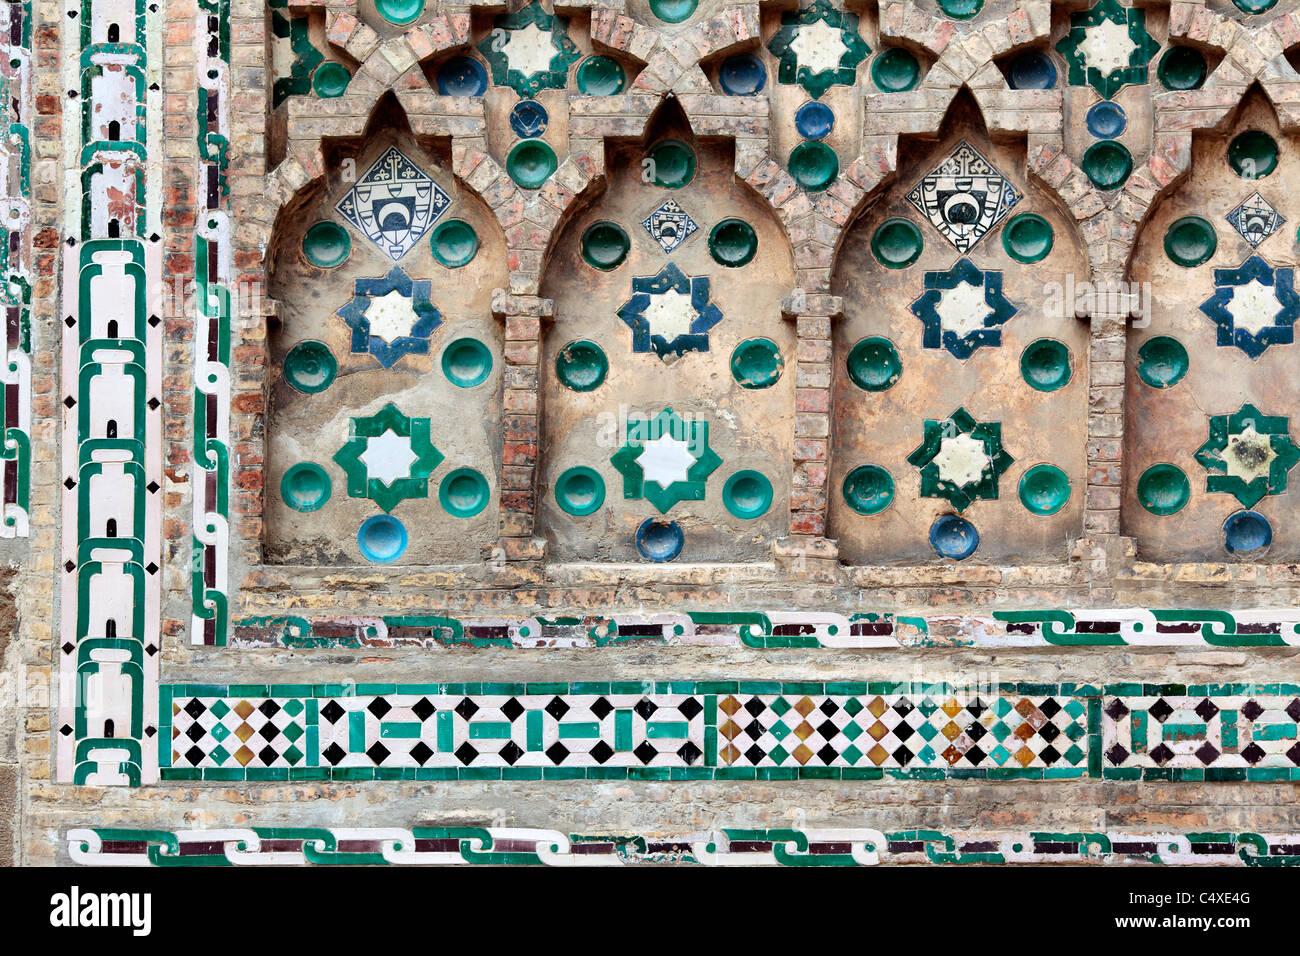 Chiesa di Santa Maria Maddalena, Saragozza, Aragona, Spagna Foto stock -  Alamy